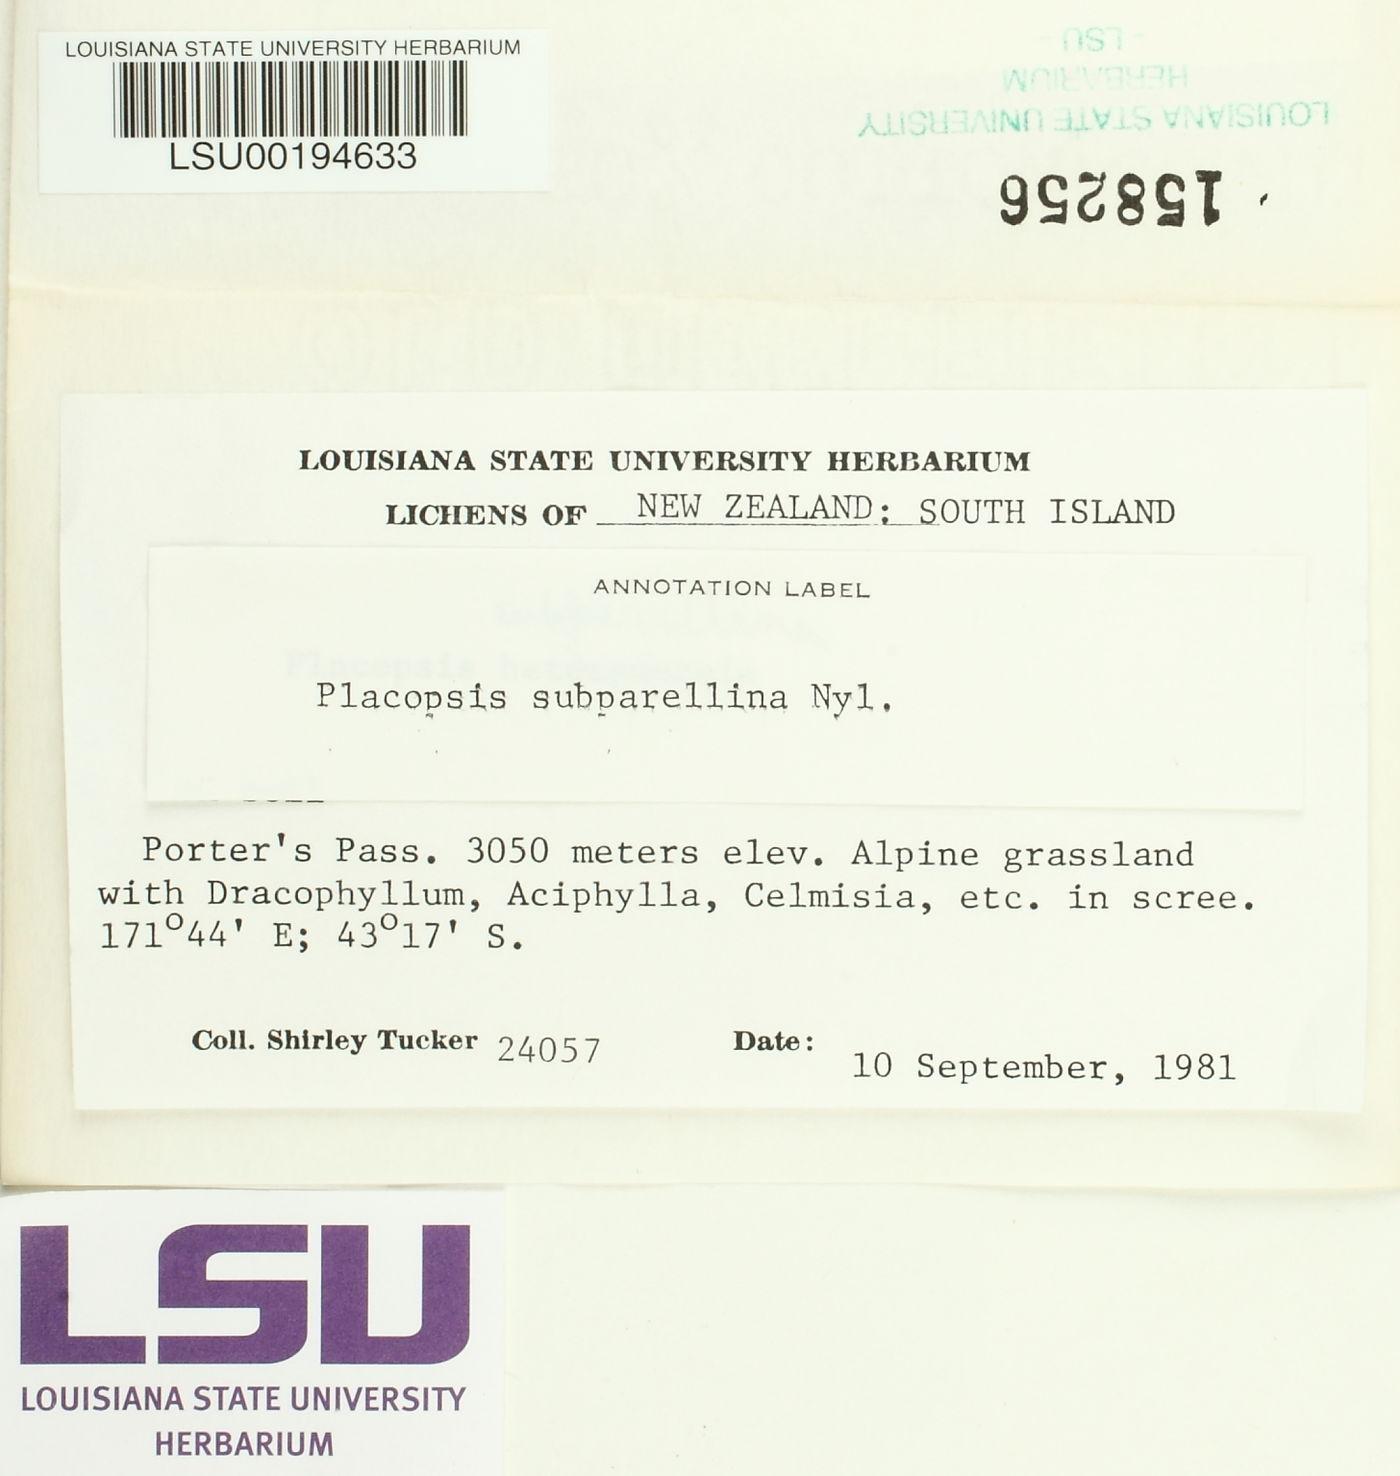 Placopsis subparellina image